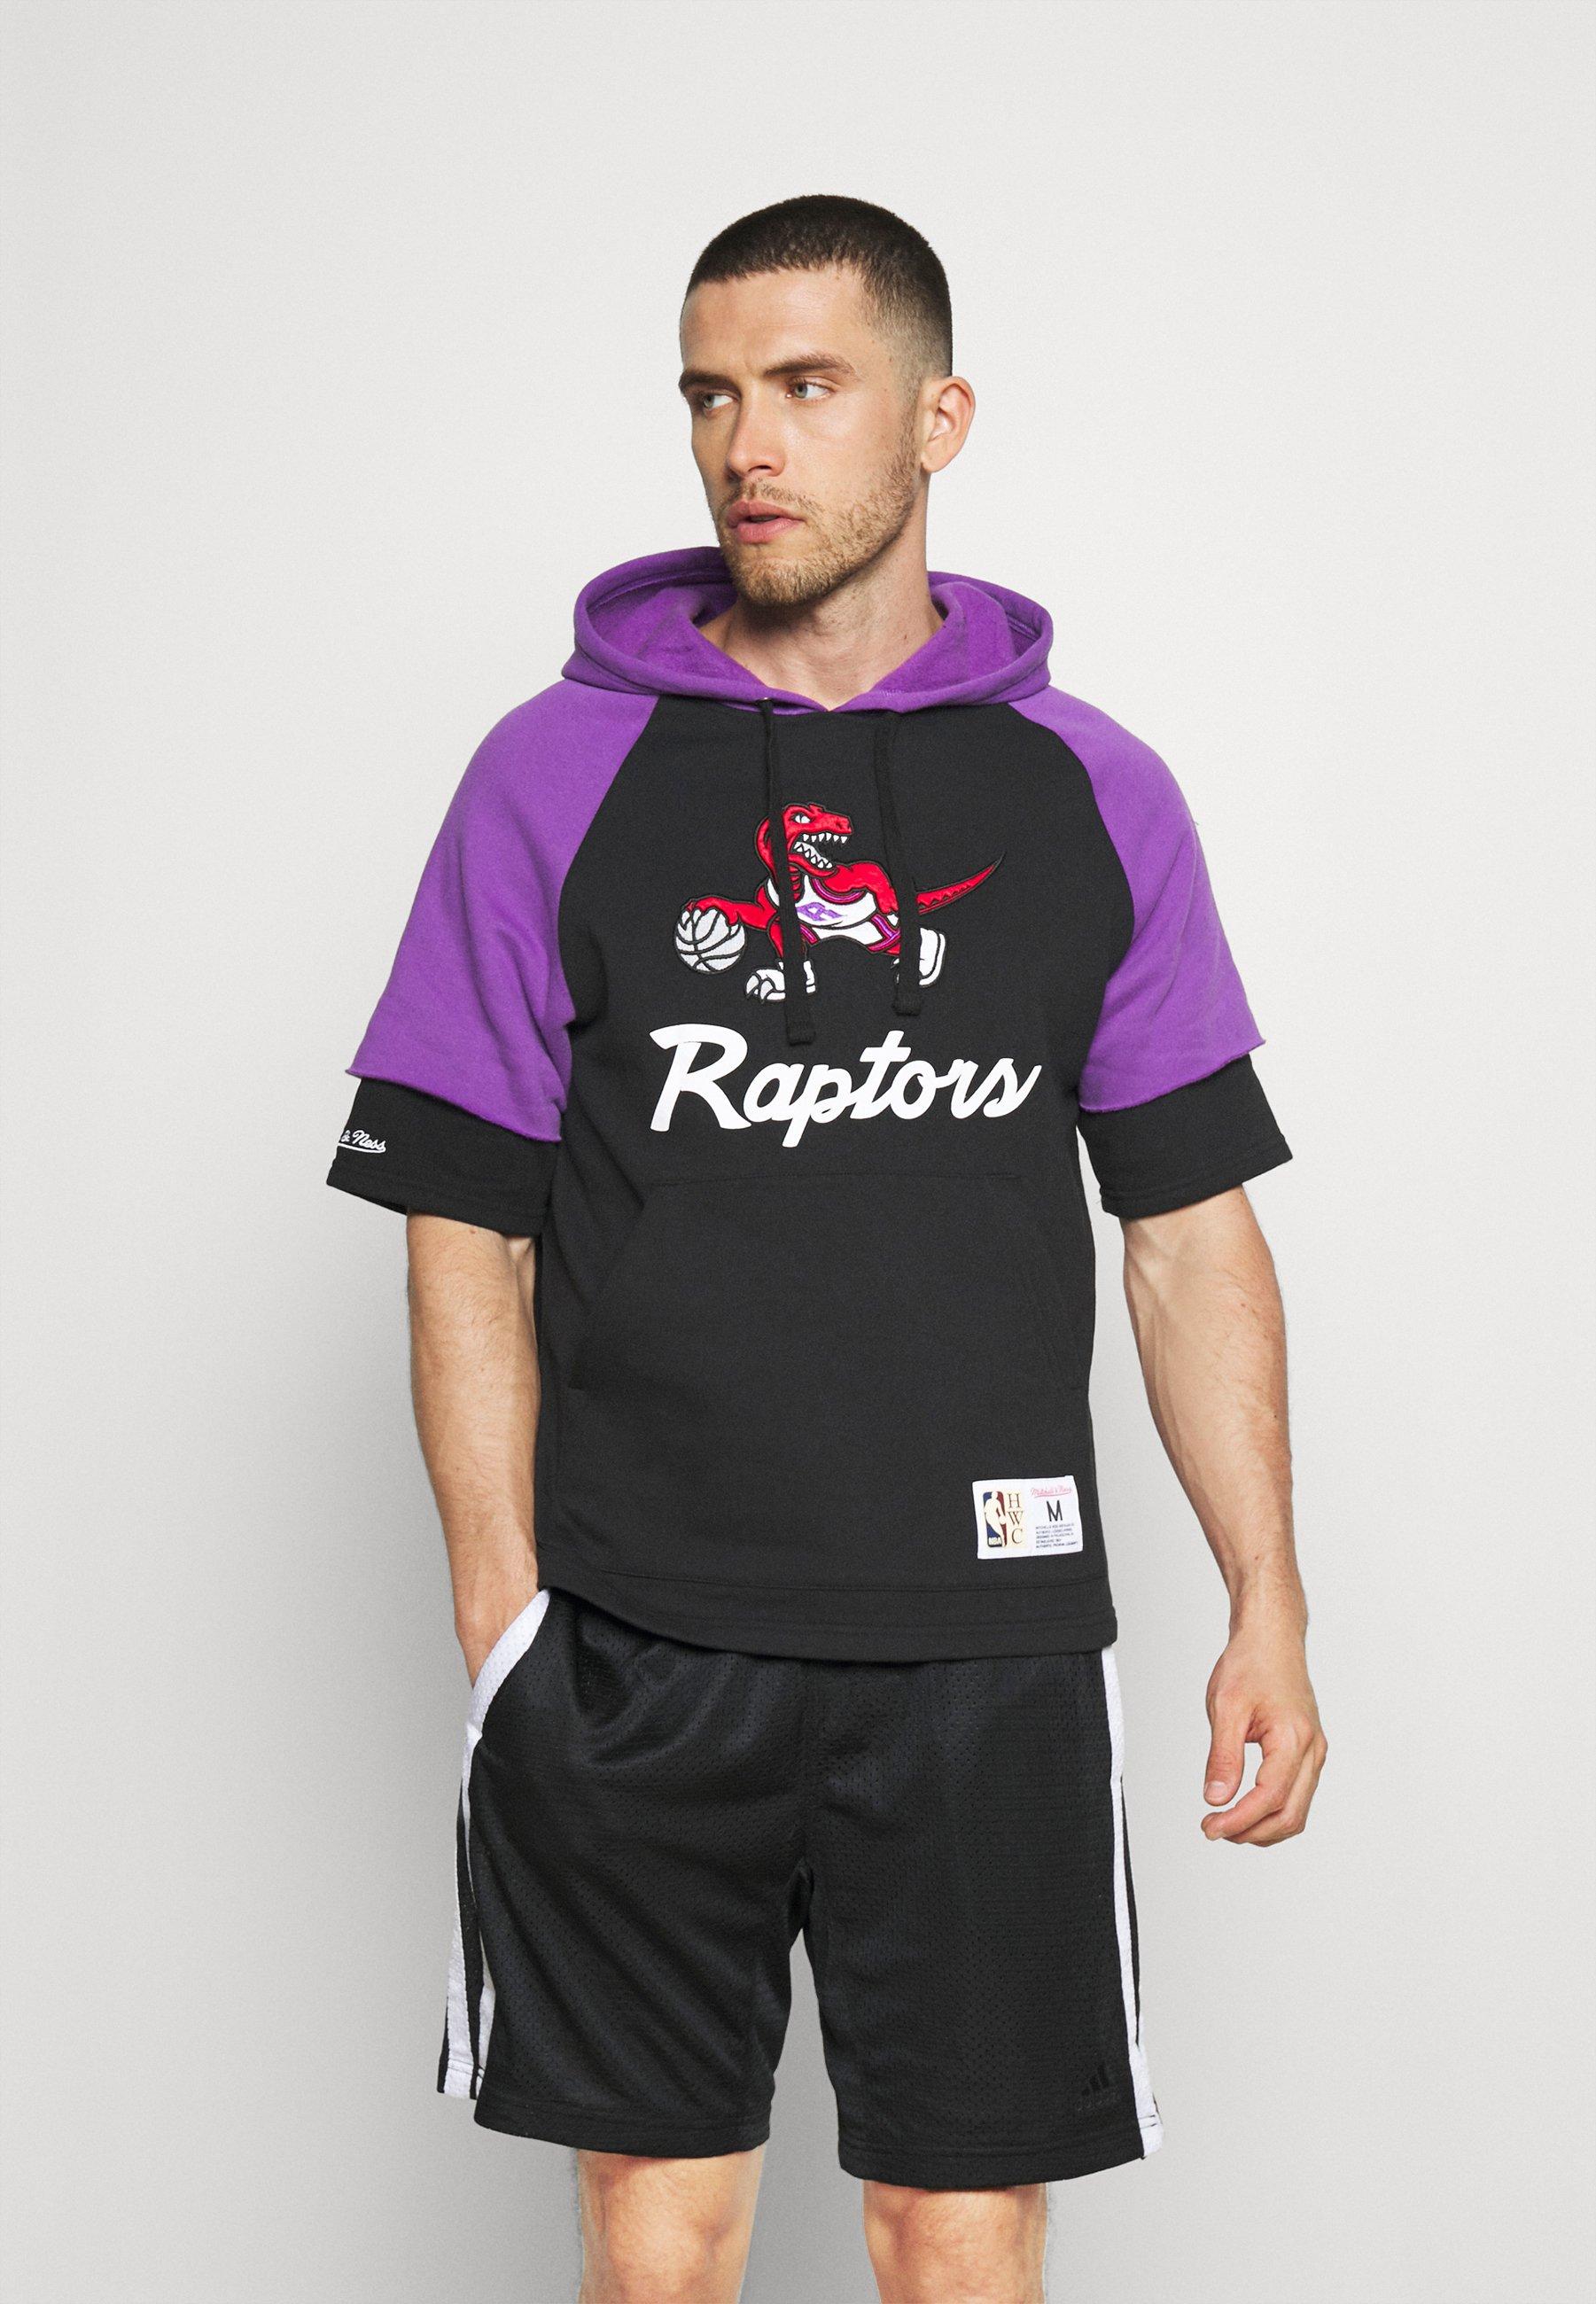 Uomo NBA TORONTO RAPTORS HOODY - Squadra